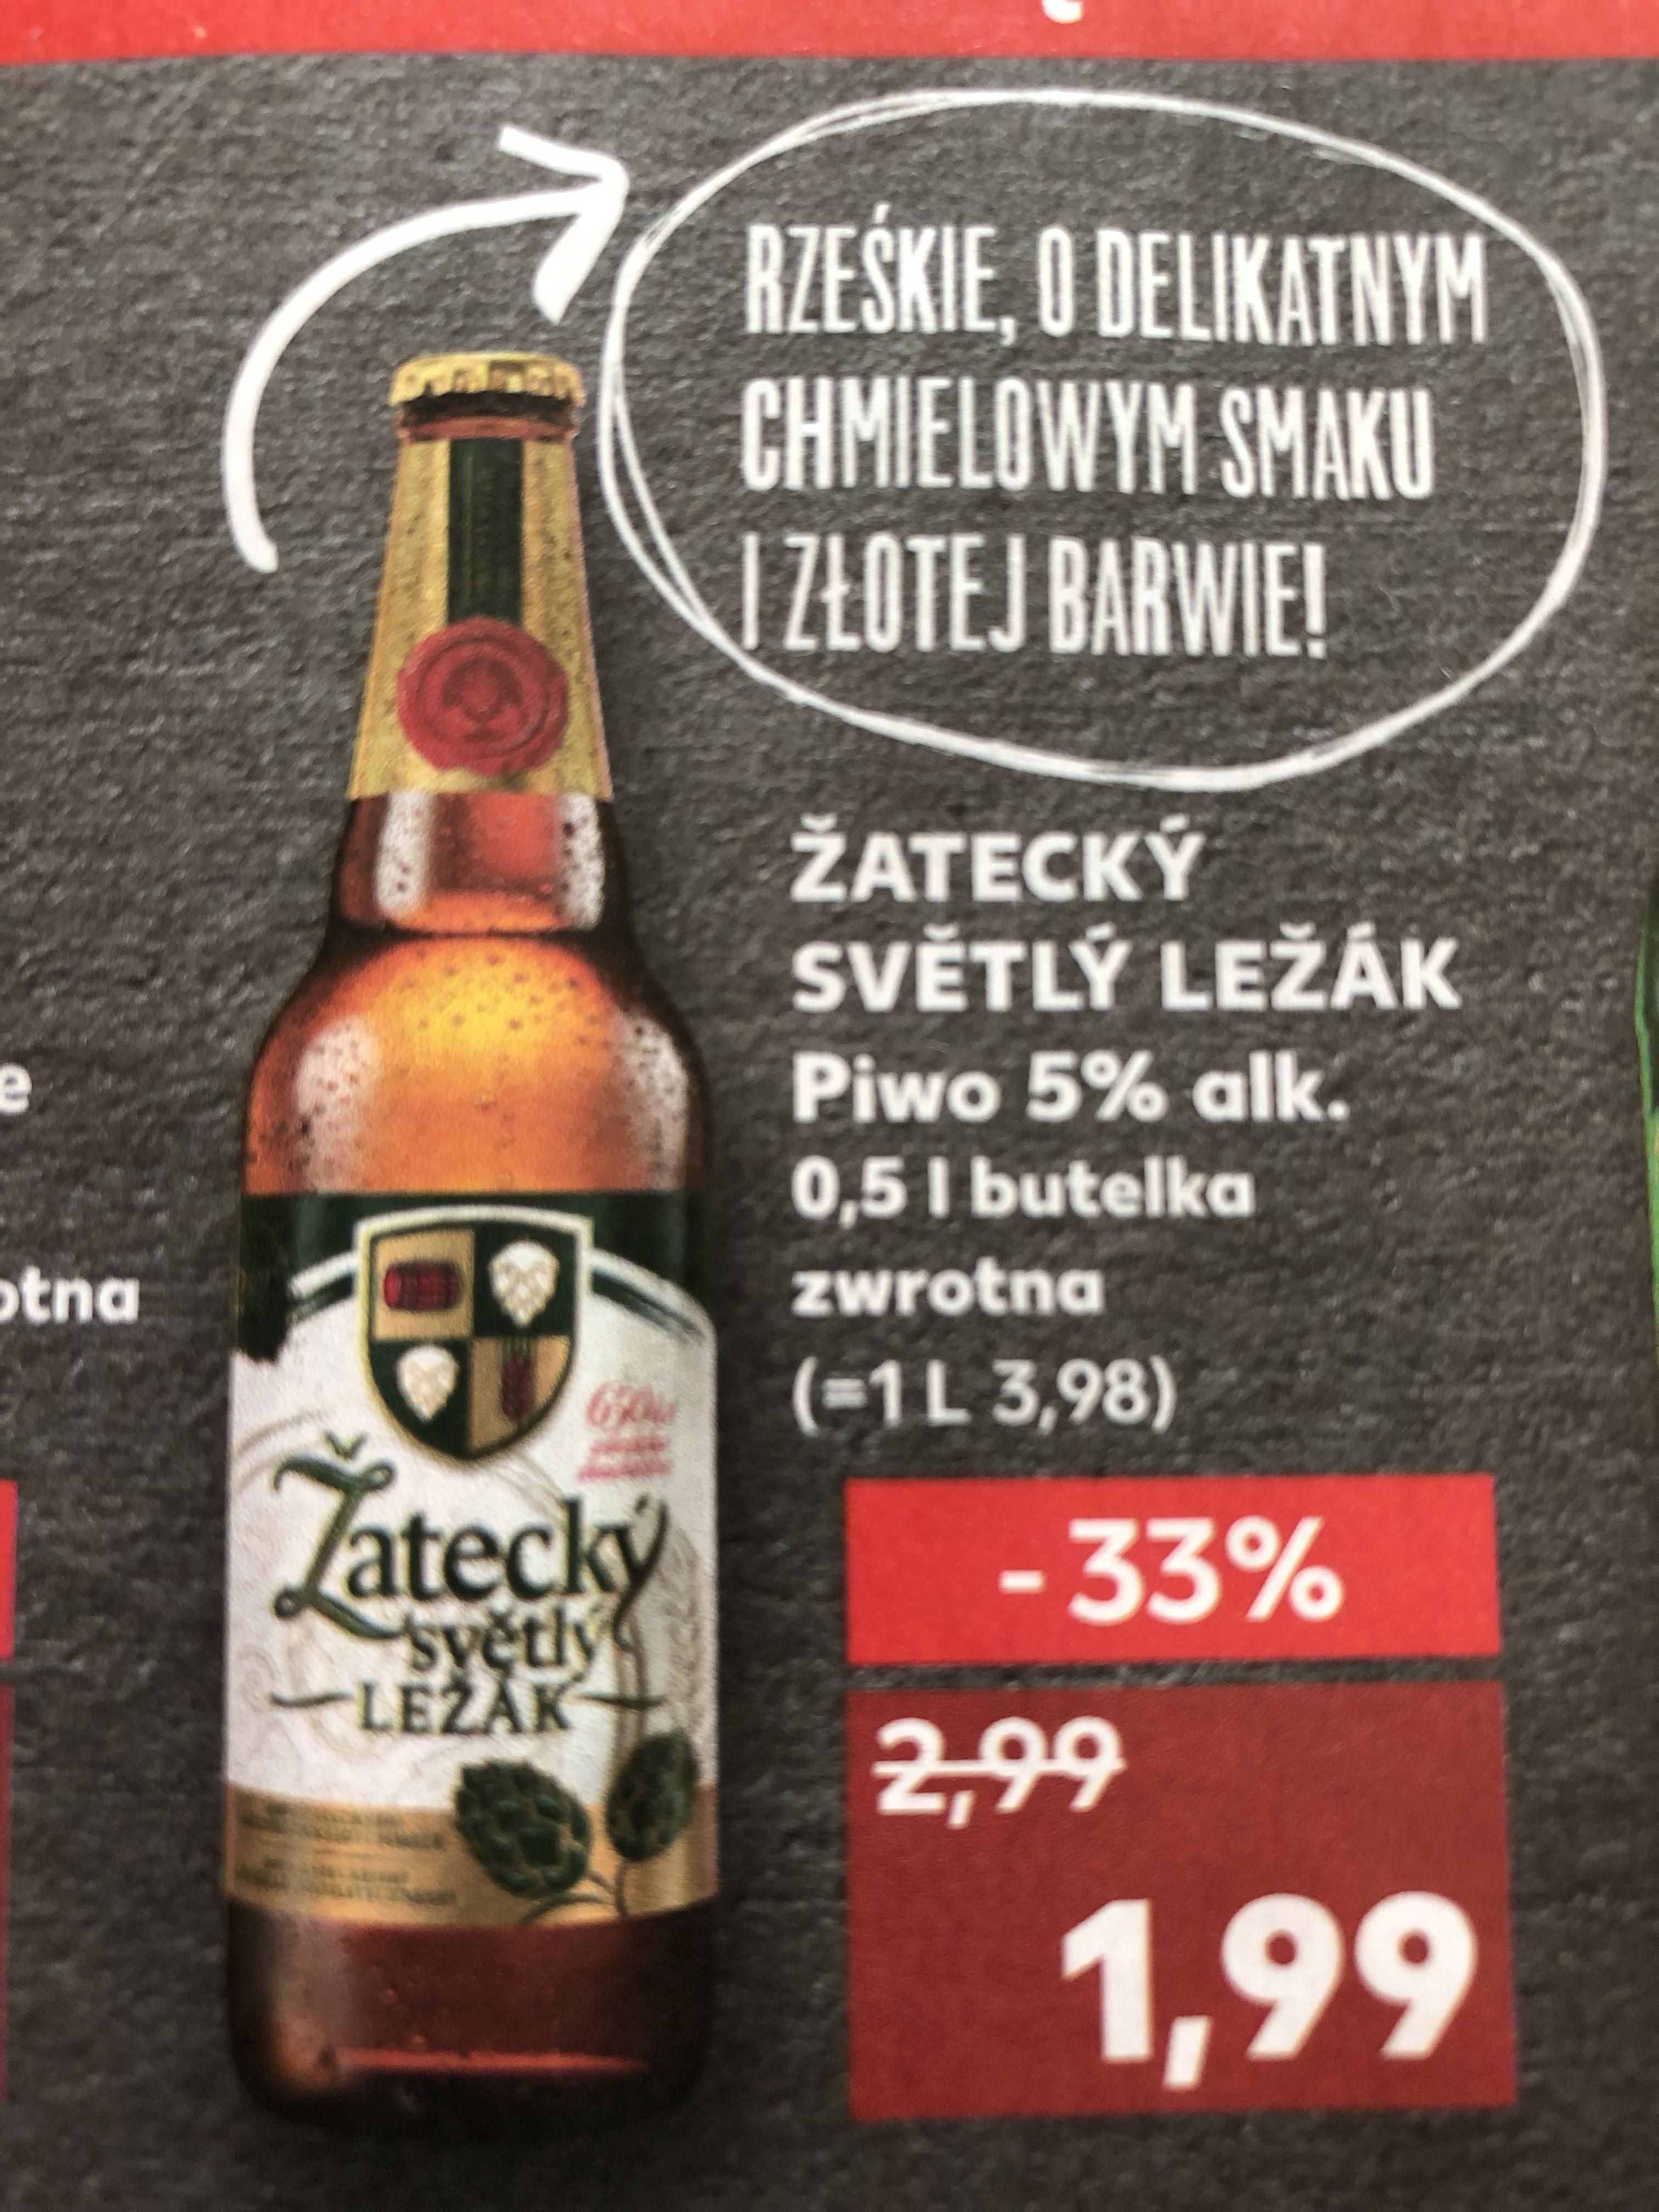 Kaufland Piwo Žatecky Svētly Ležāk 0,5 l po 1,99 zł